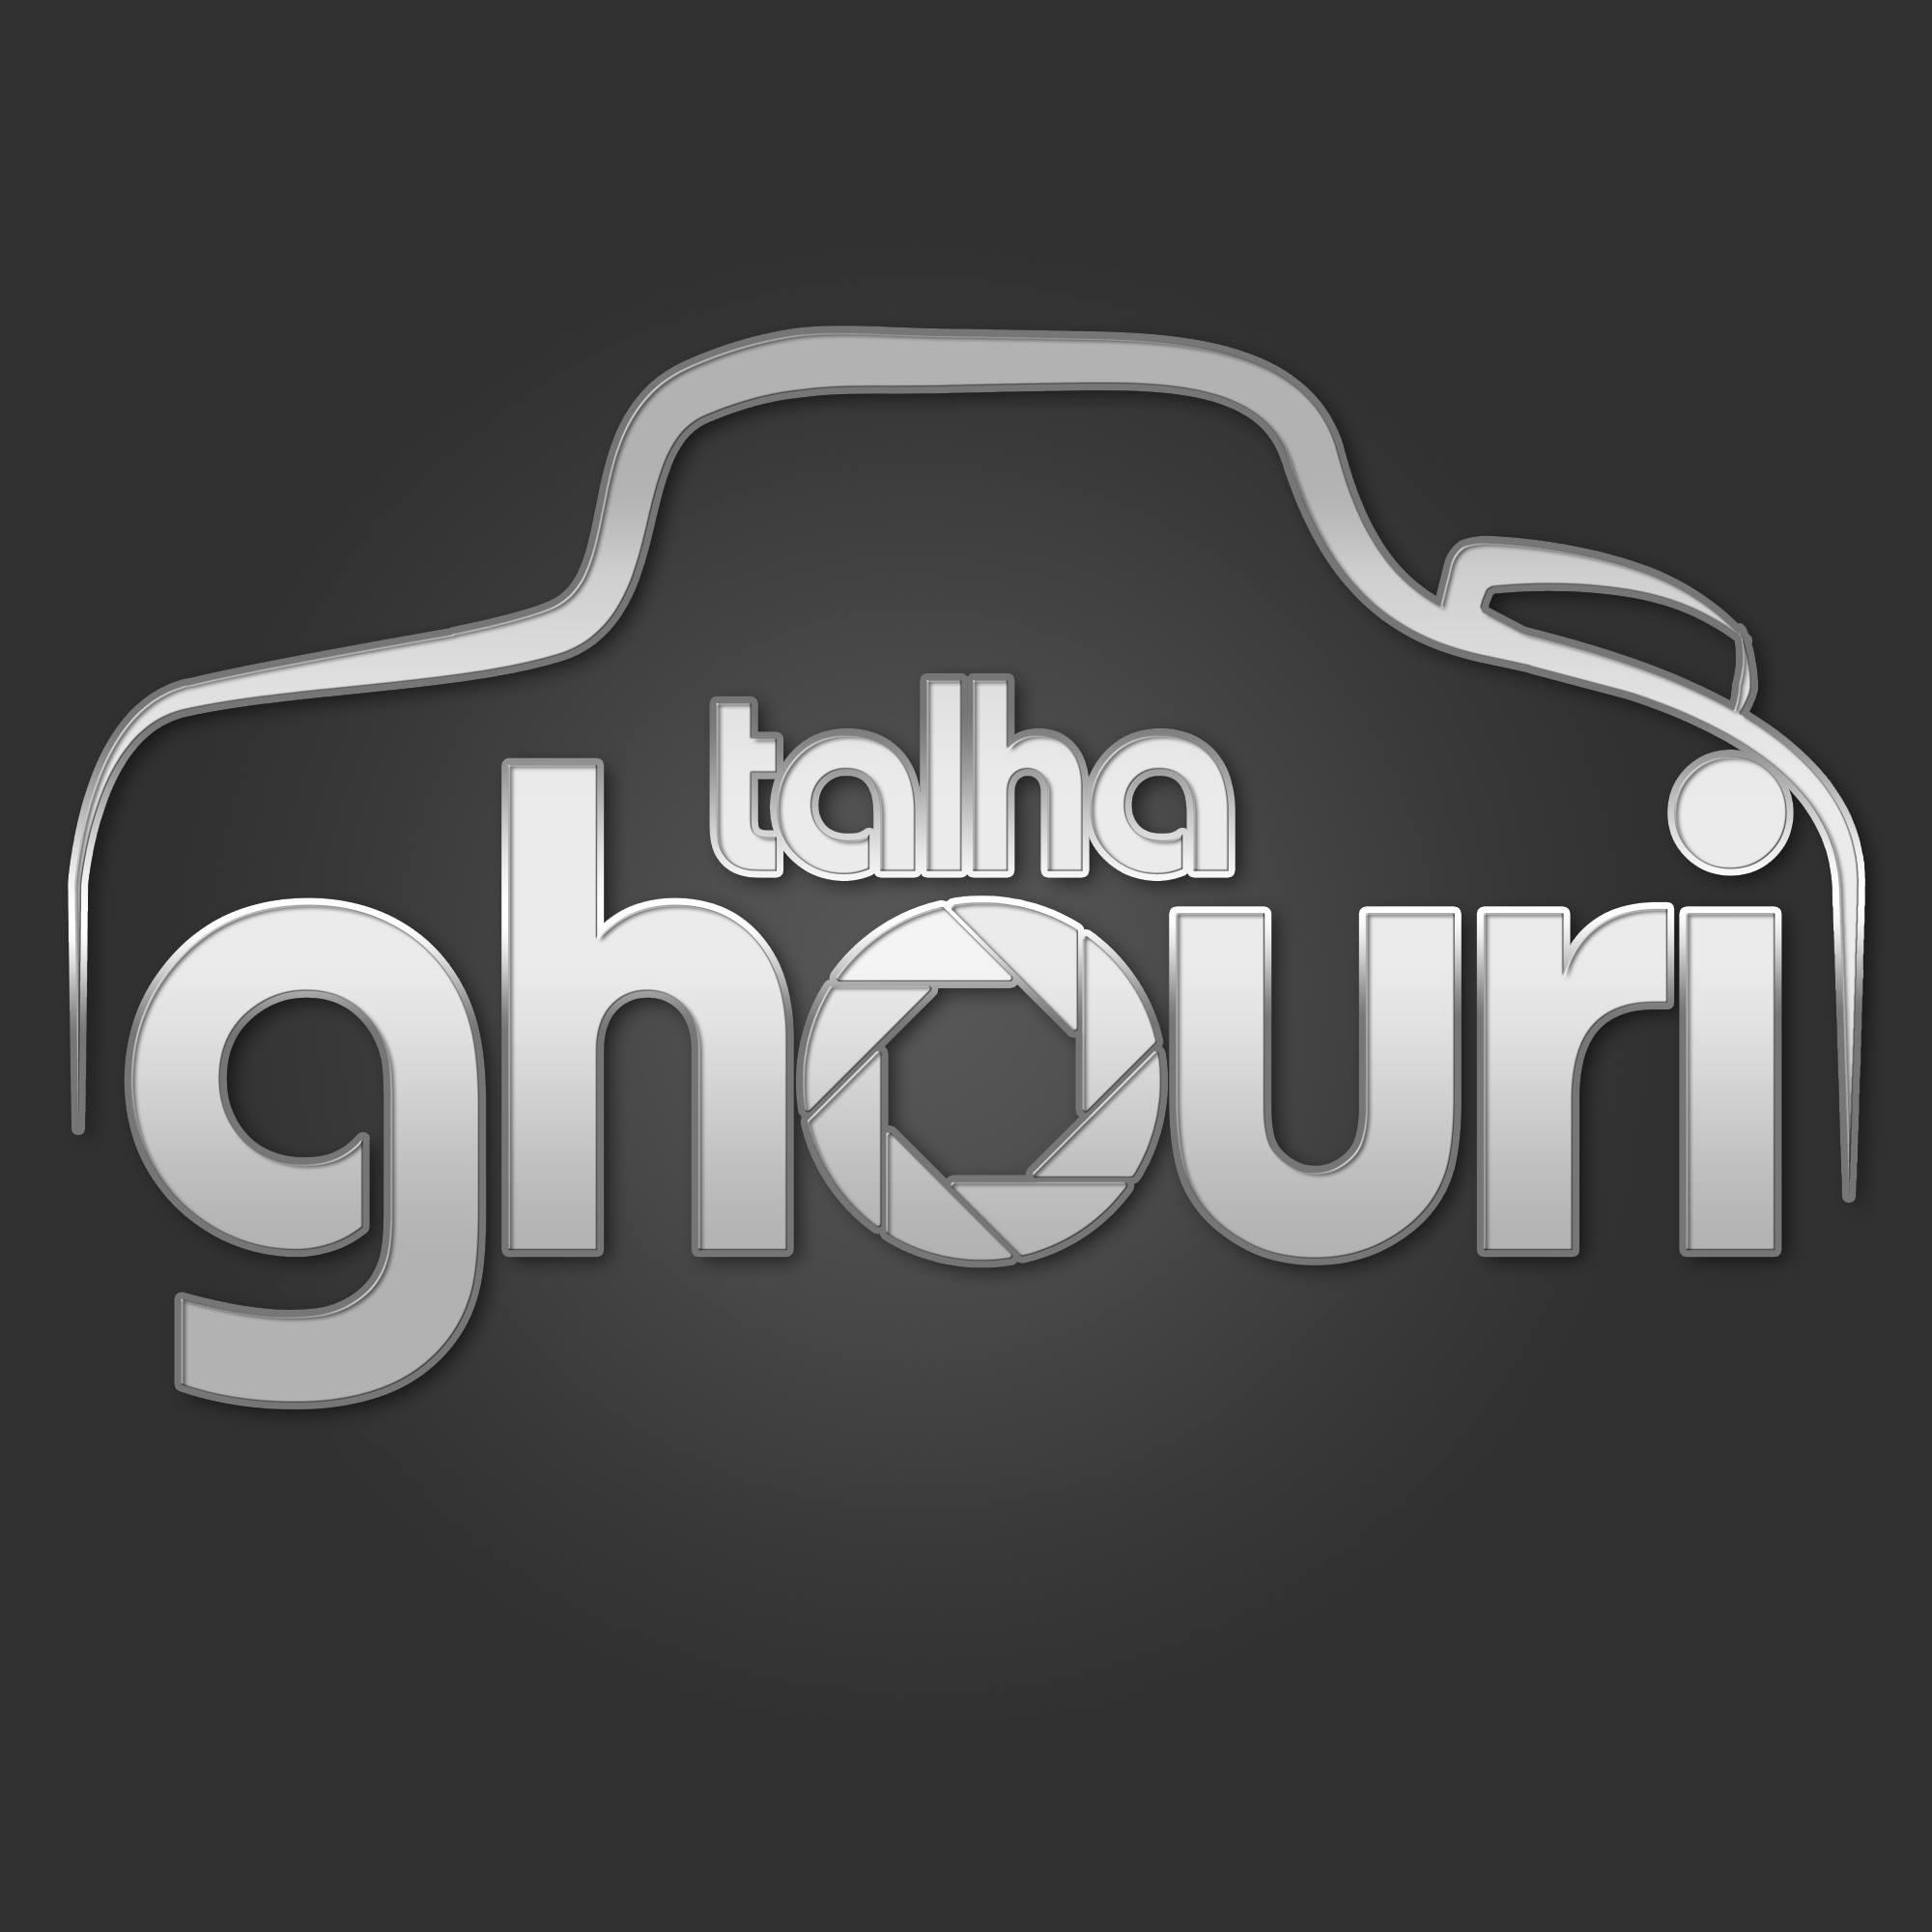 DIPLOMA IN PHOTOGRAPHY | Talha Ghouri Photography | 24 Jan, 2021